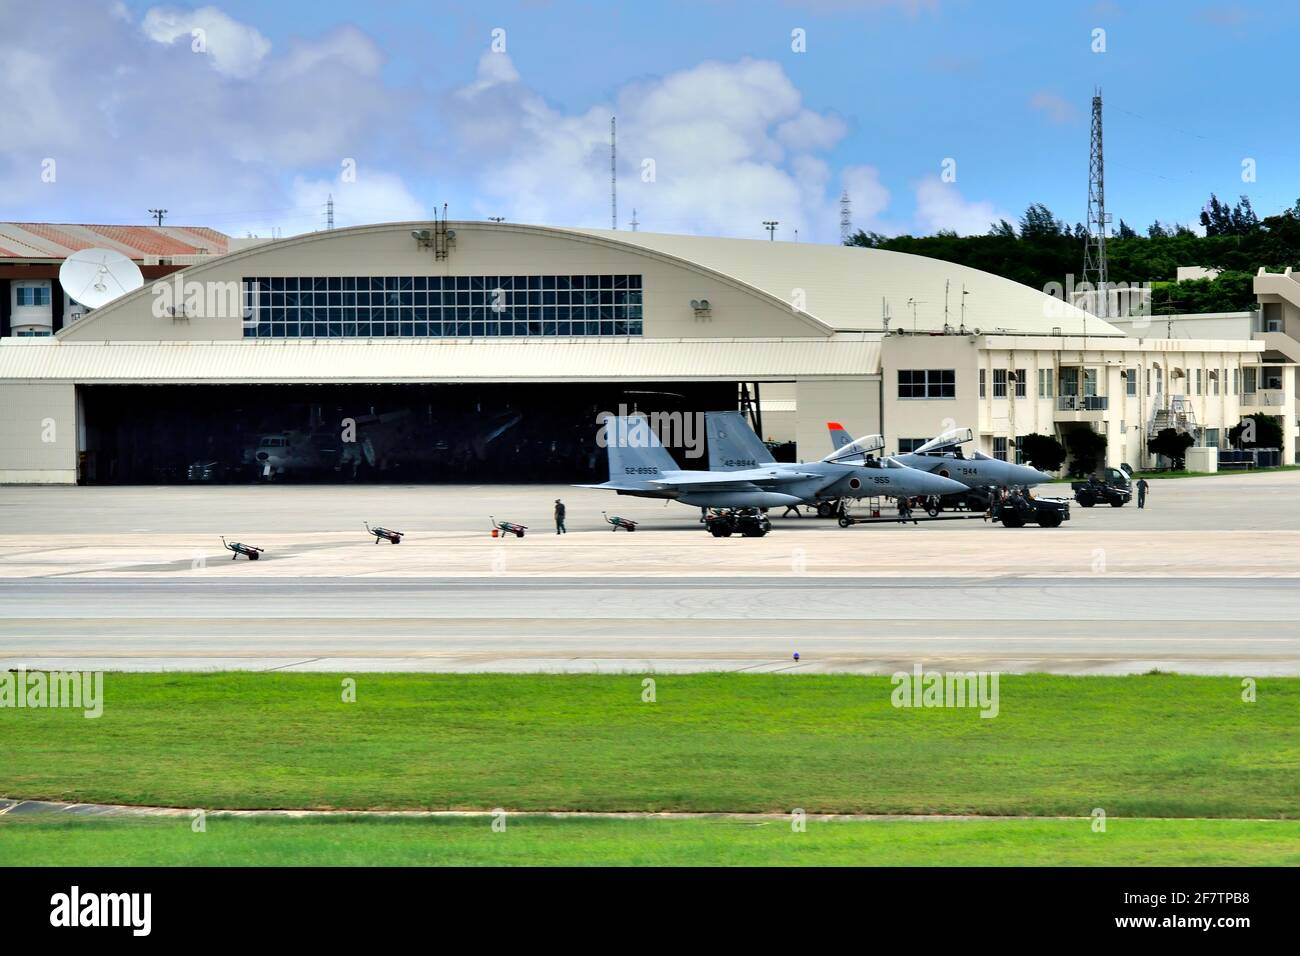 Intervention rapide, attente, JSDF , Mitsubishi F-15J, parking, Aéroport de Naha, Okinawa, Japon Banque D'Images